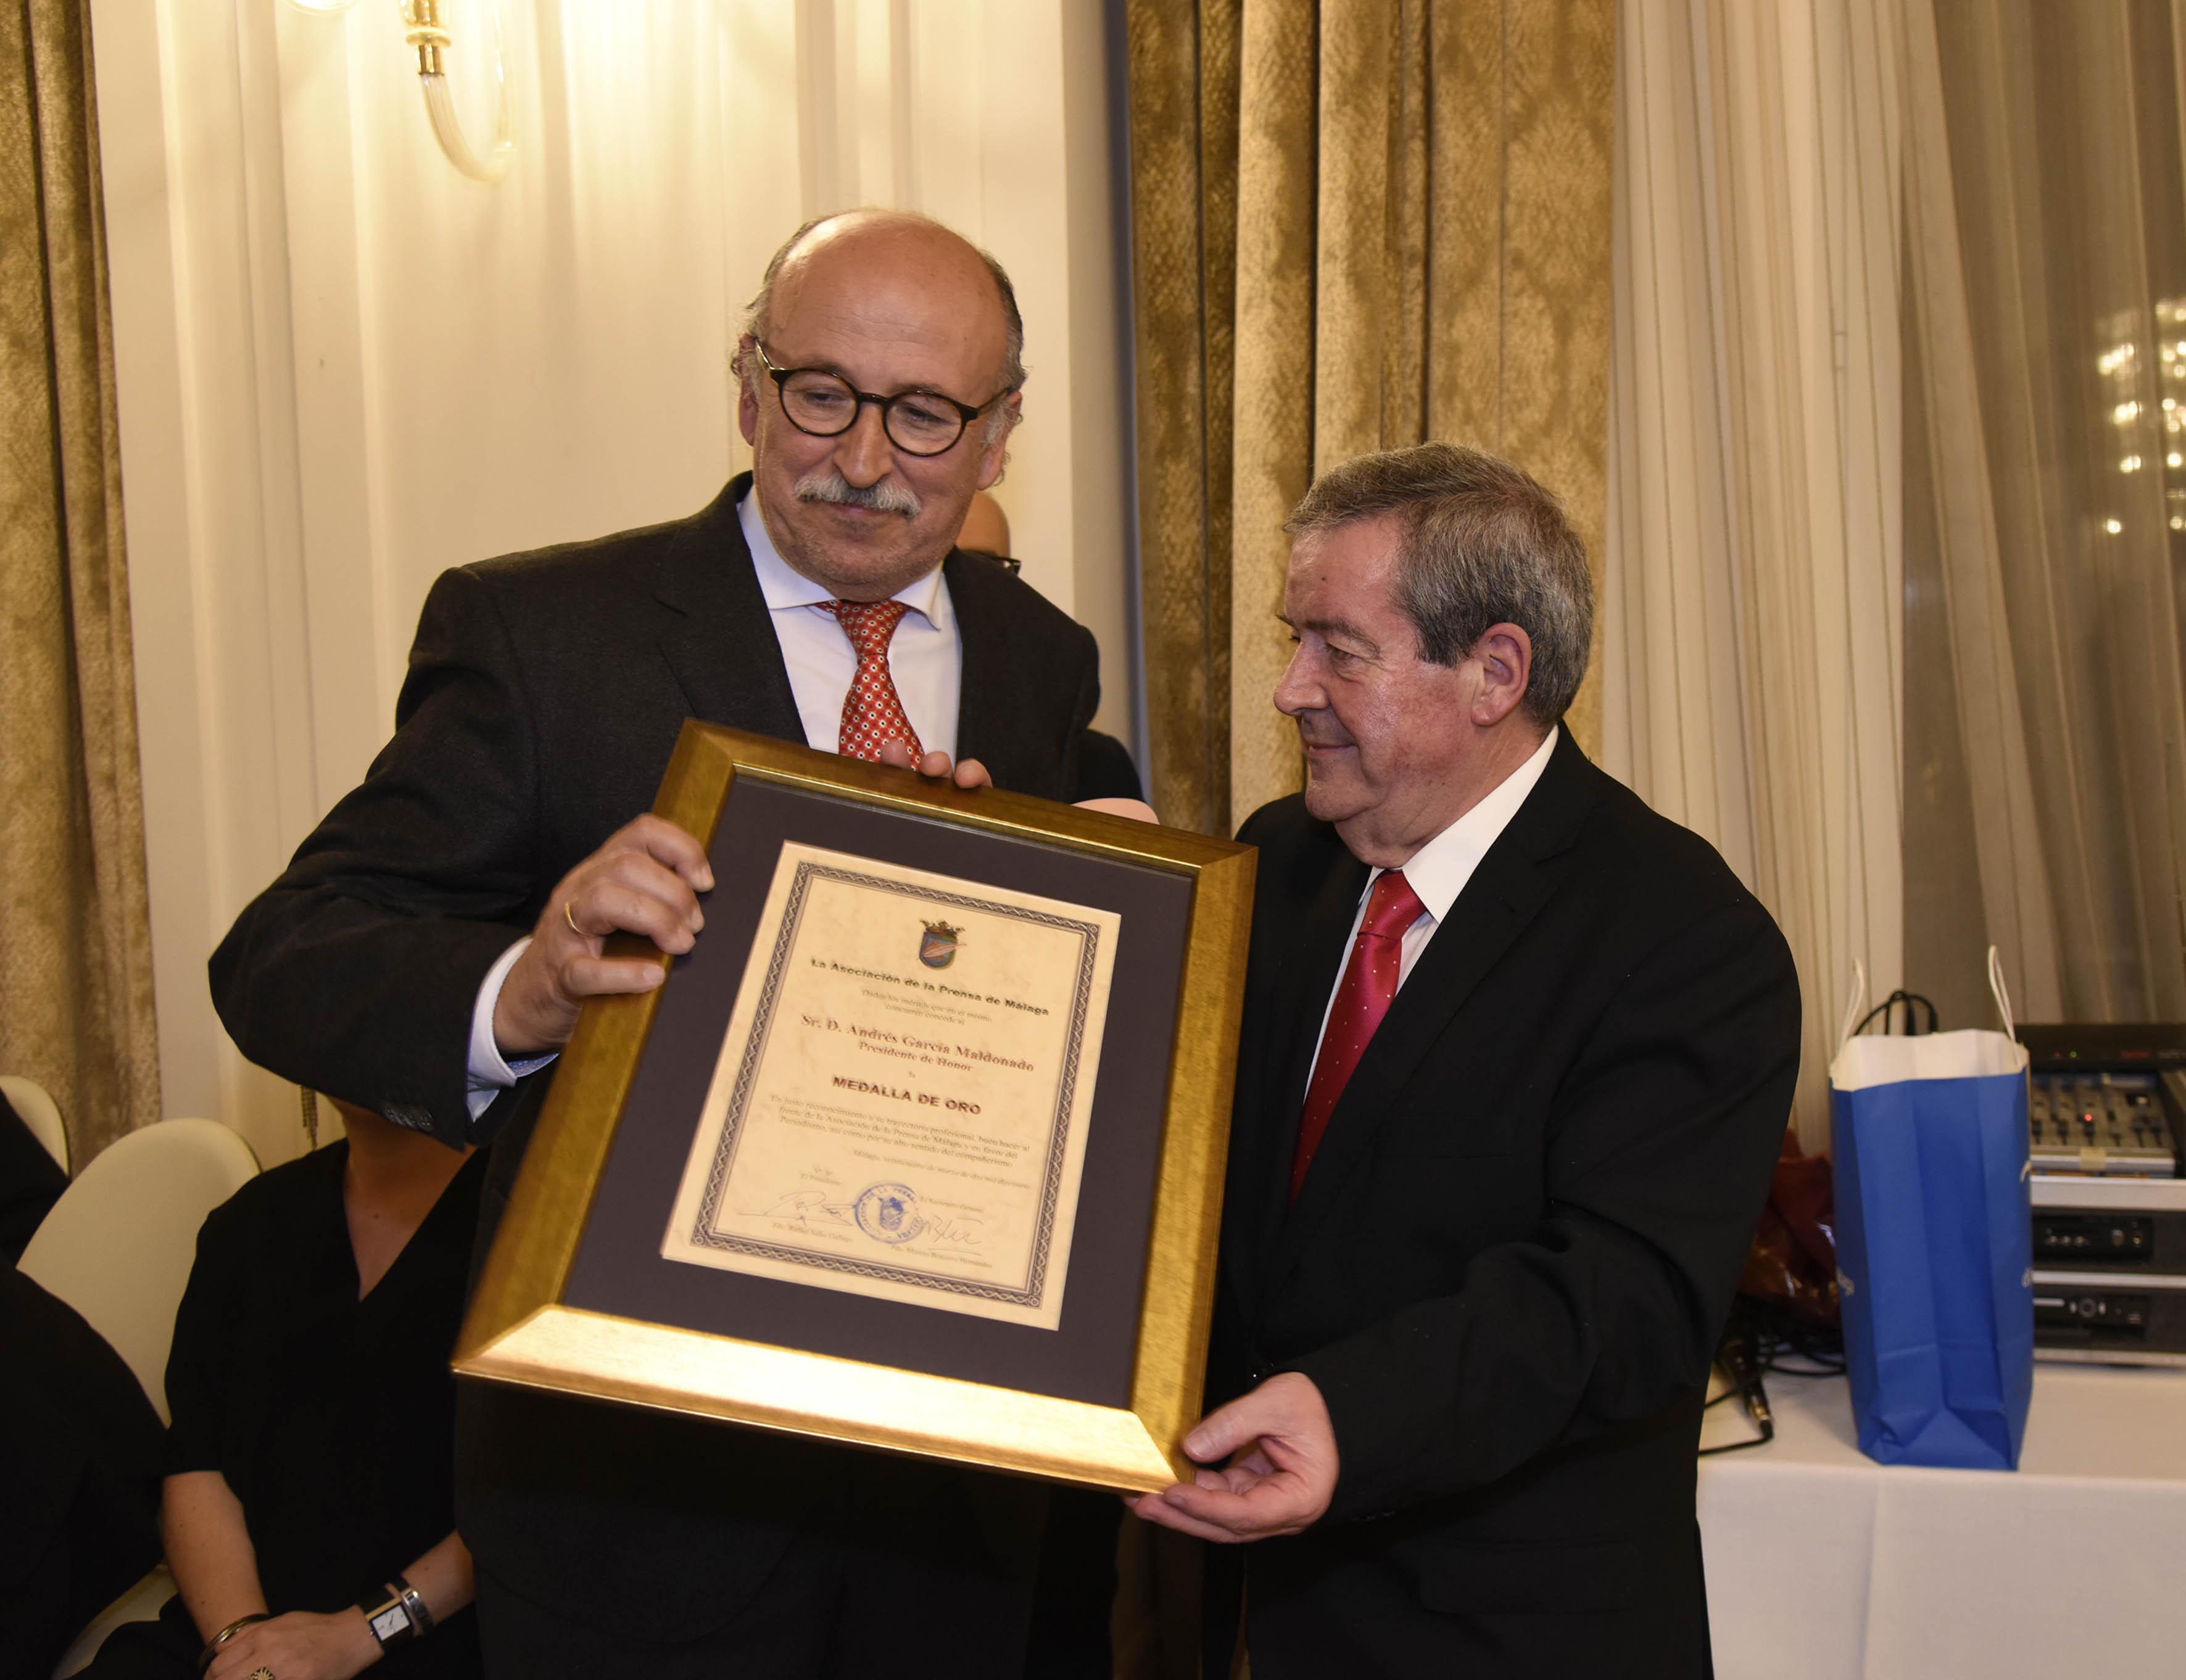 Andrés y Rafael 2